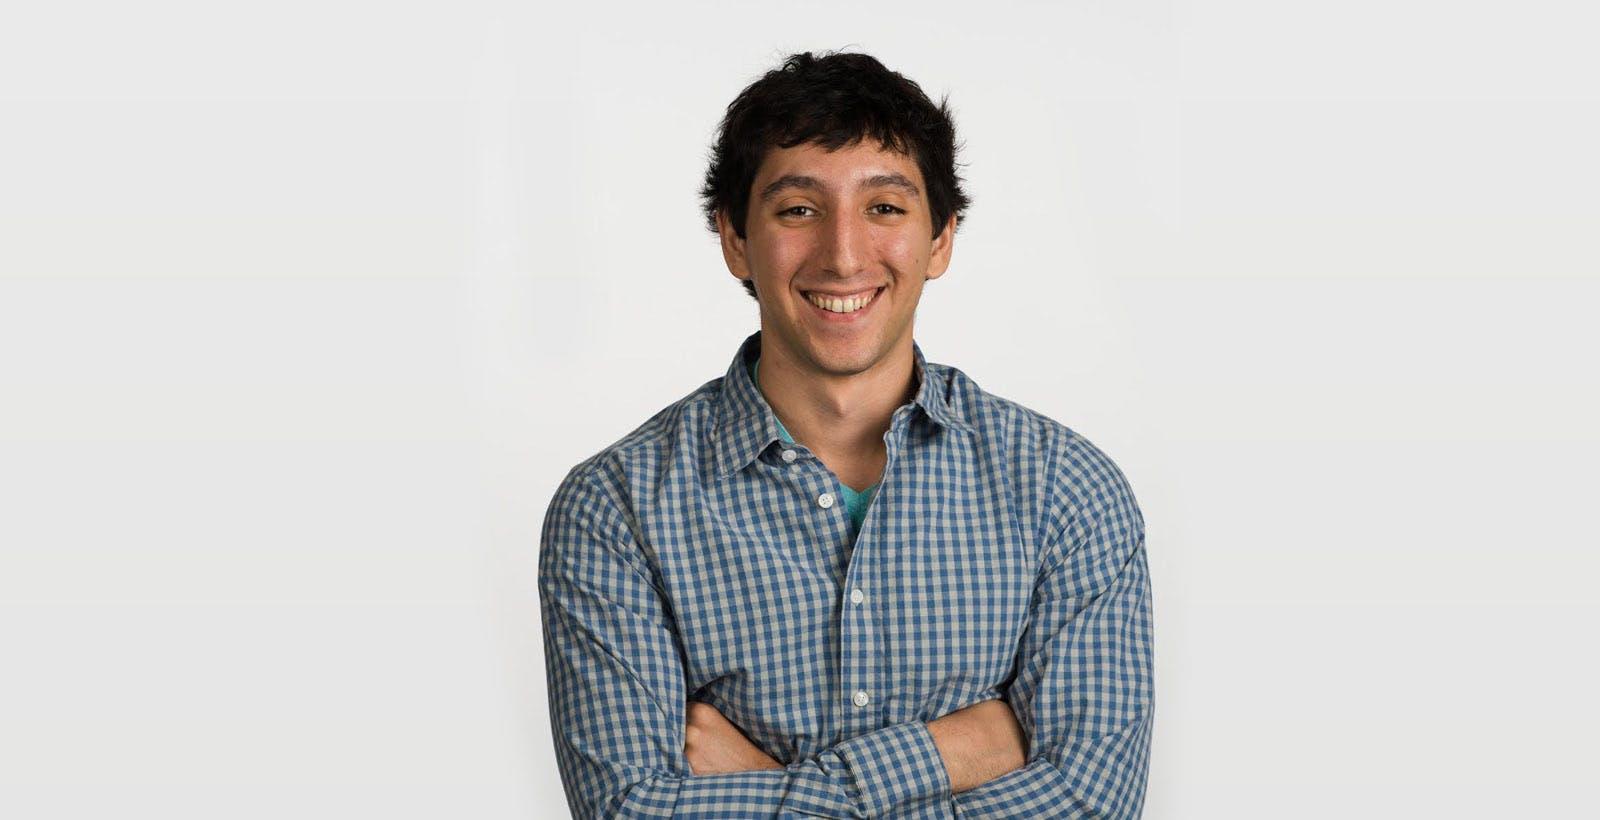 OX Blog ChrisRomano - Buyer Spotlight: Chris Romano, Director of Platforms, Amnet